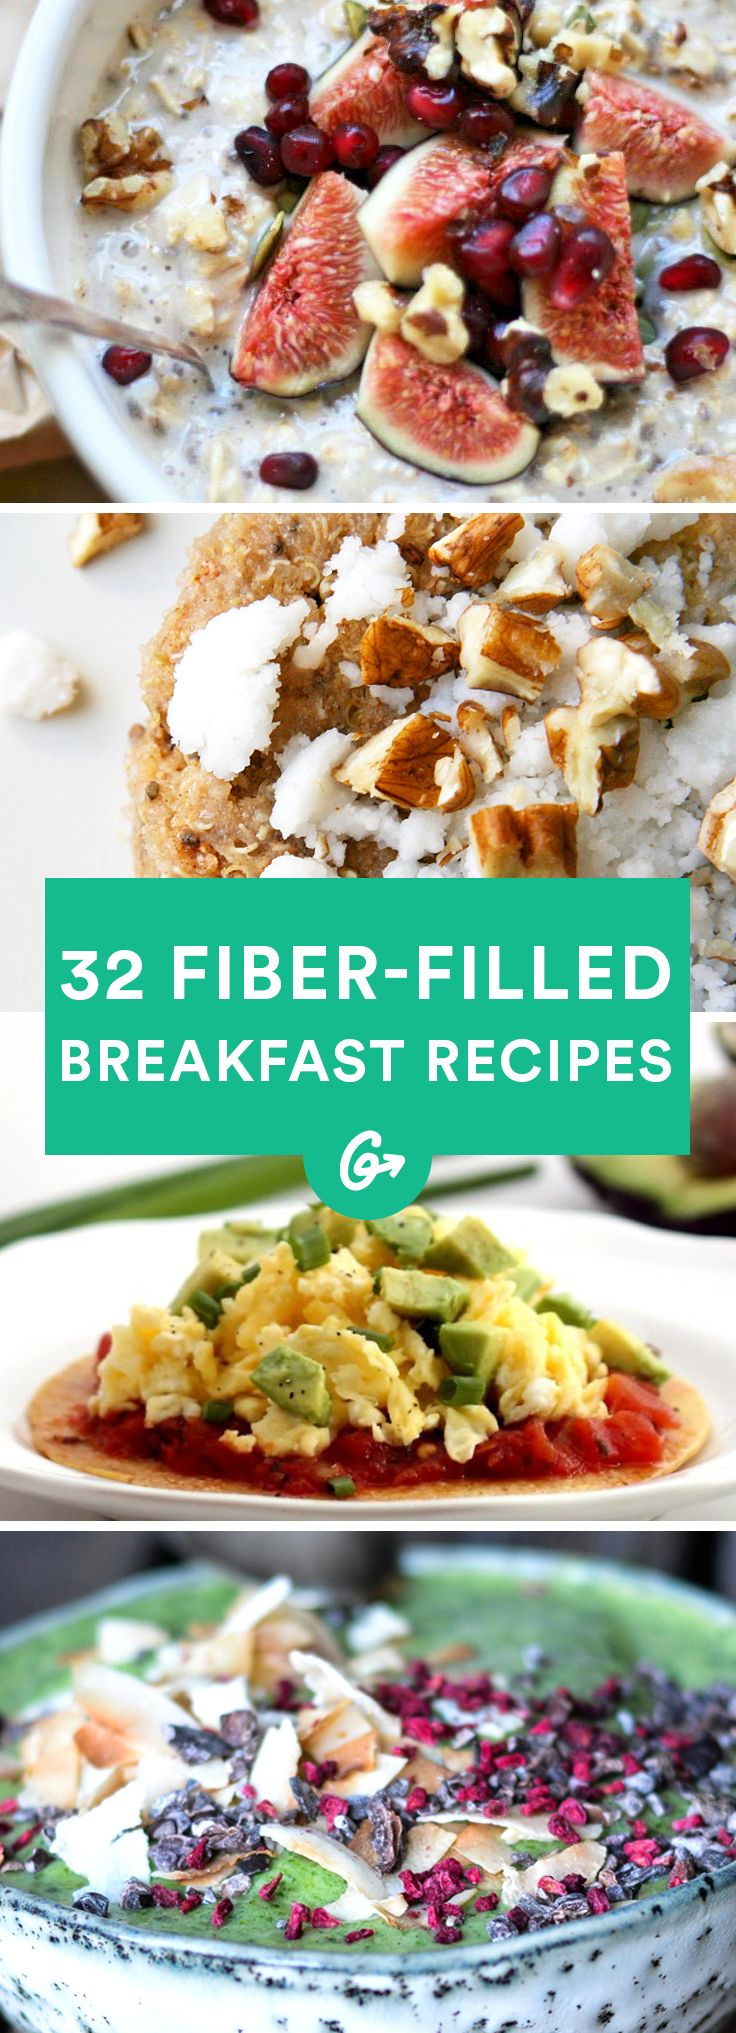 19 FiberFilled Breakfast Recipes High fiber breakfast